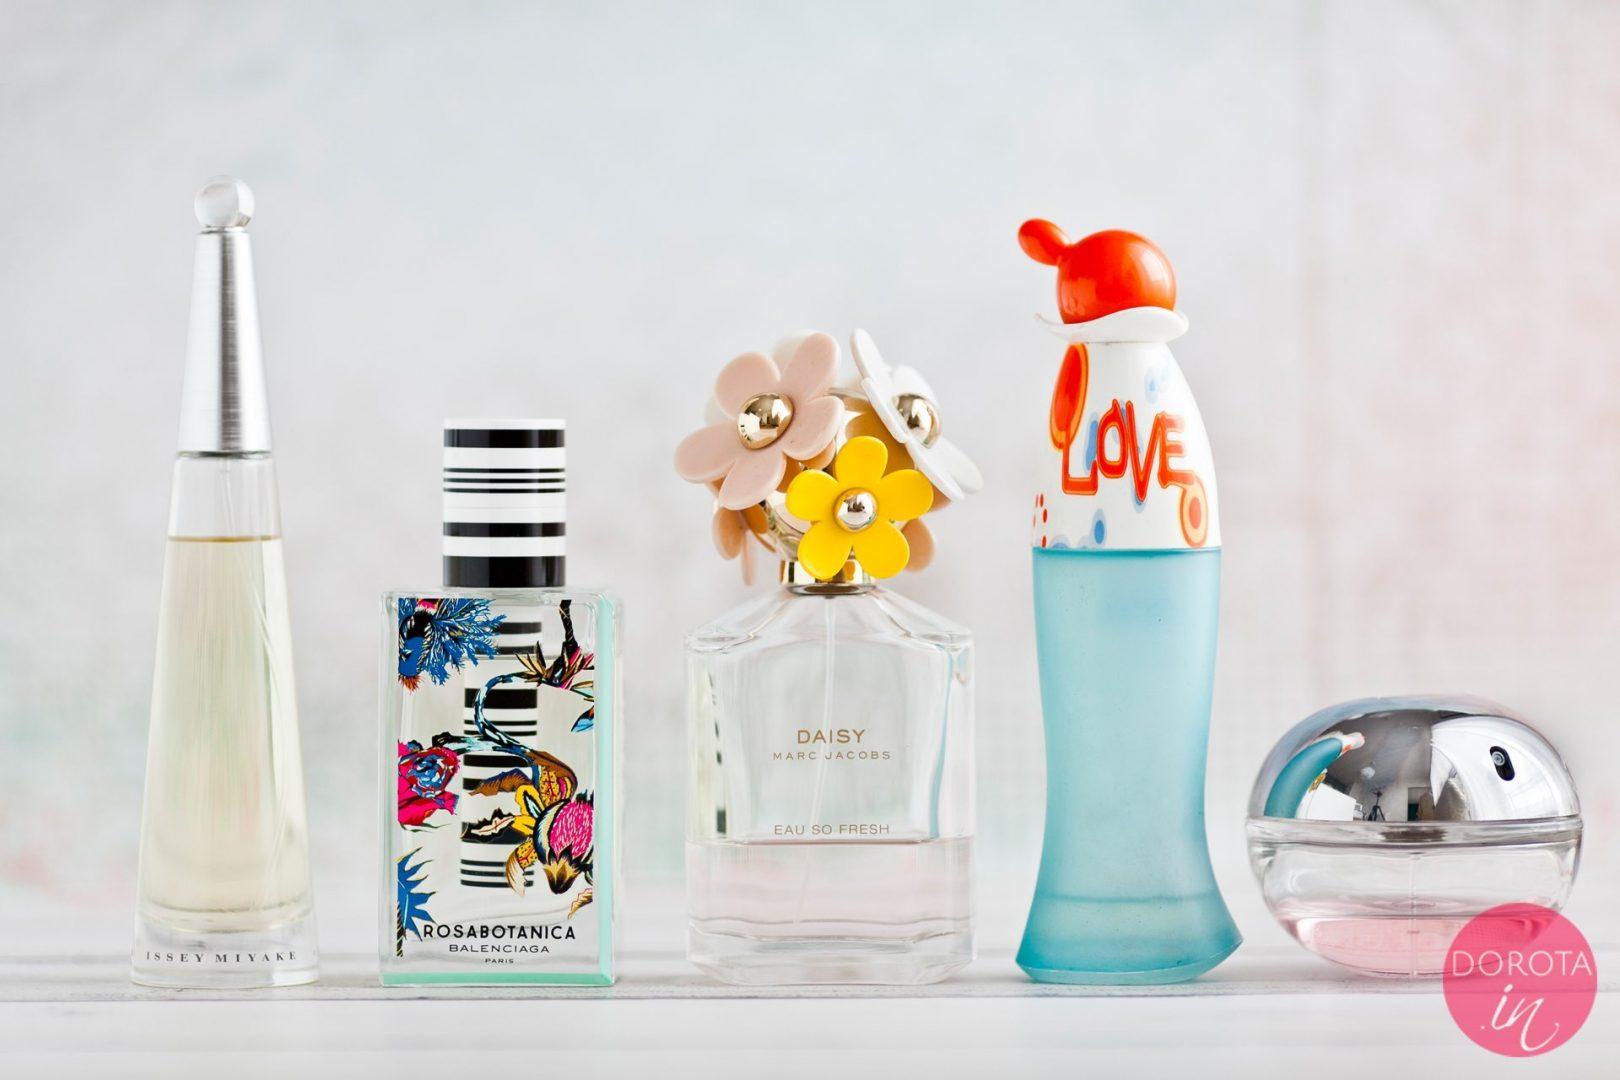 Ulubione perfumy Dorota Kamińska